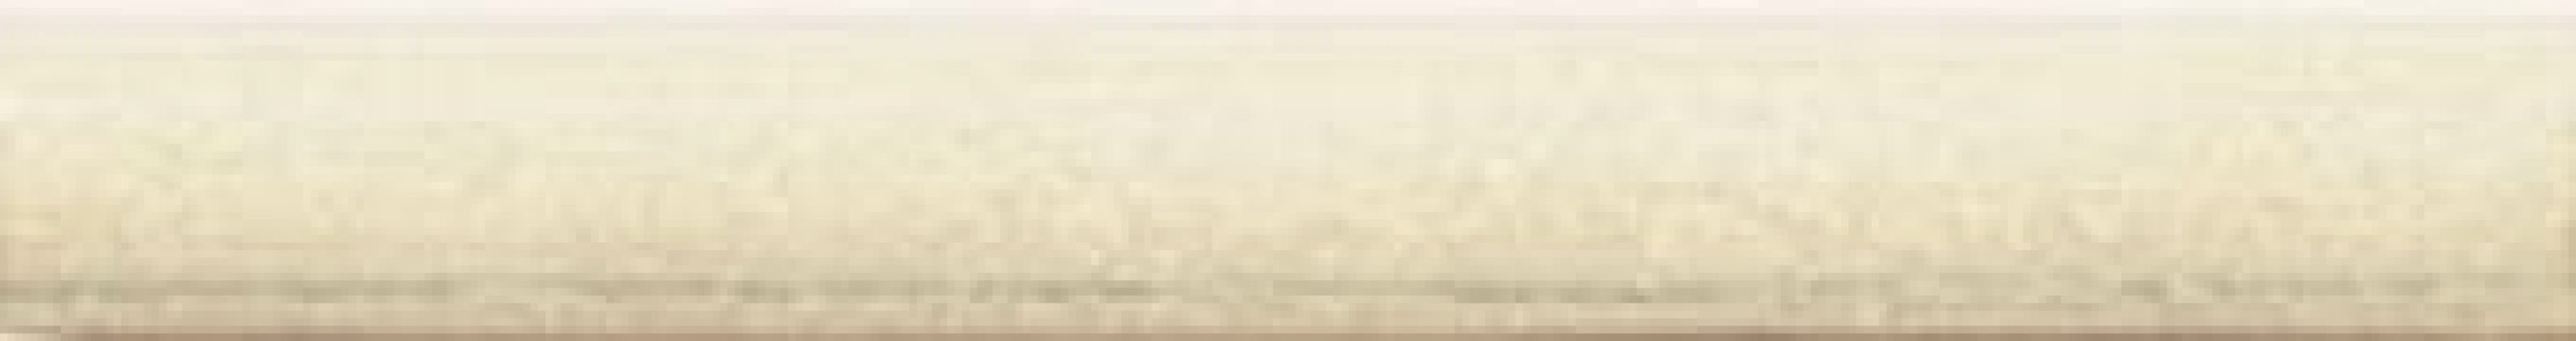 TORELO CHIC BONE 2x15